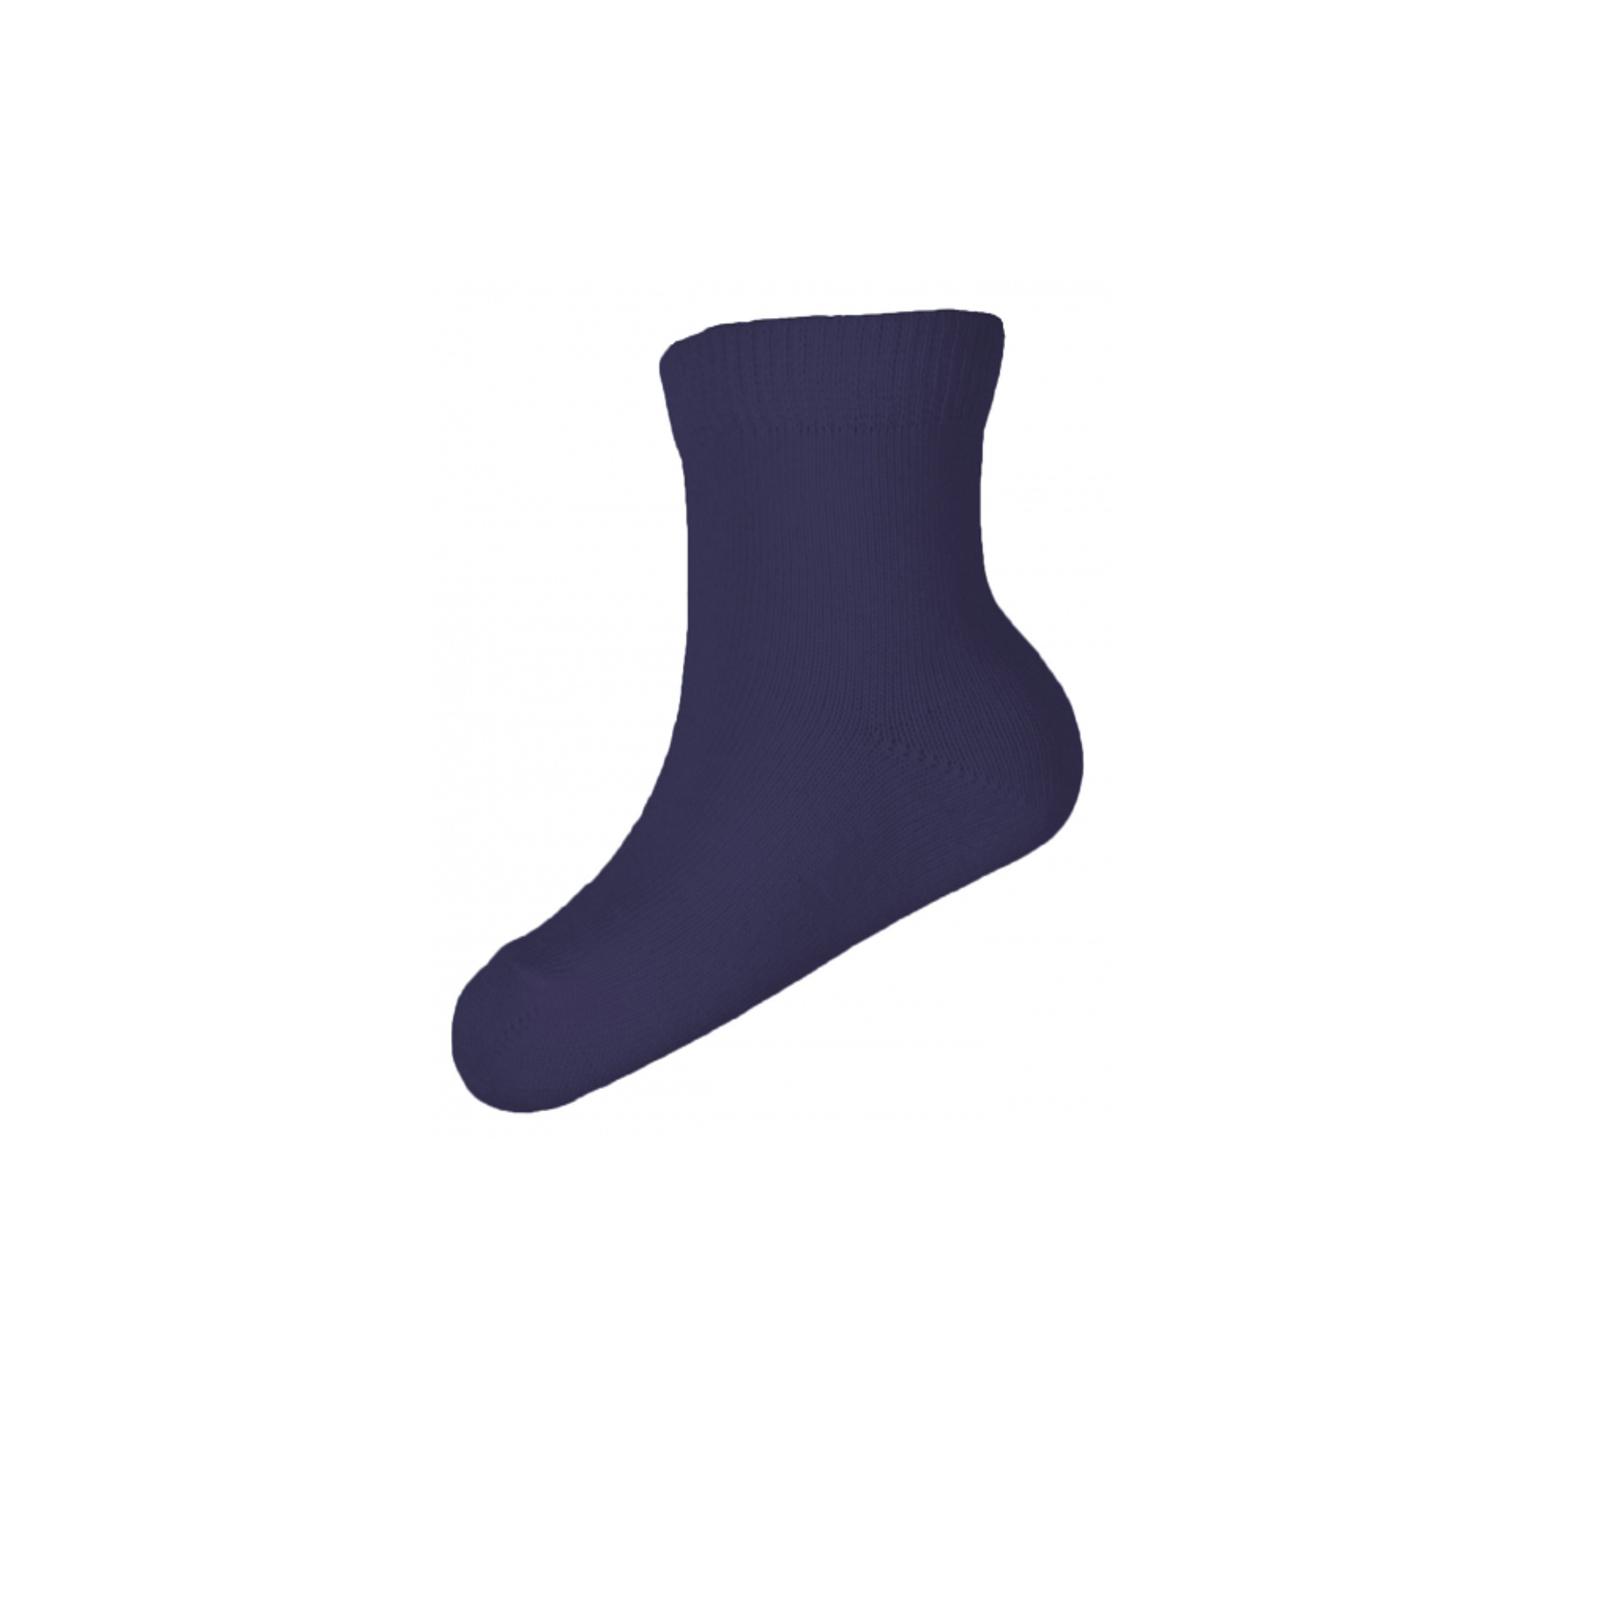 Носки Milusie модель 52 гладкие размер 9-10